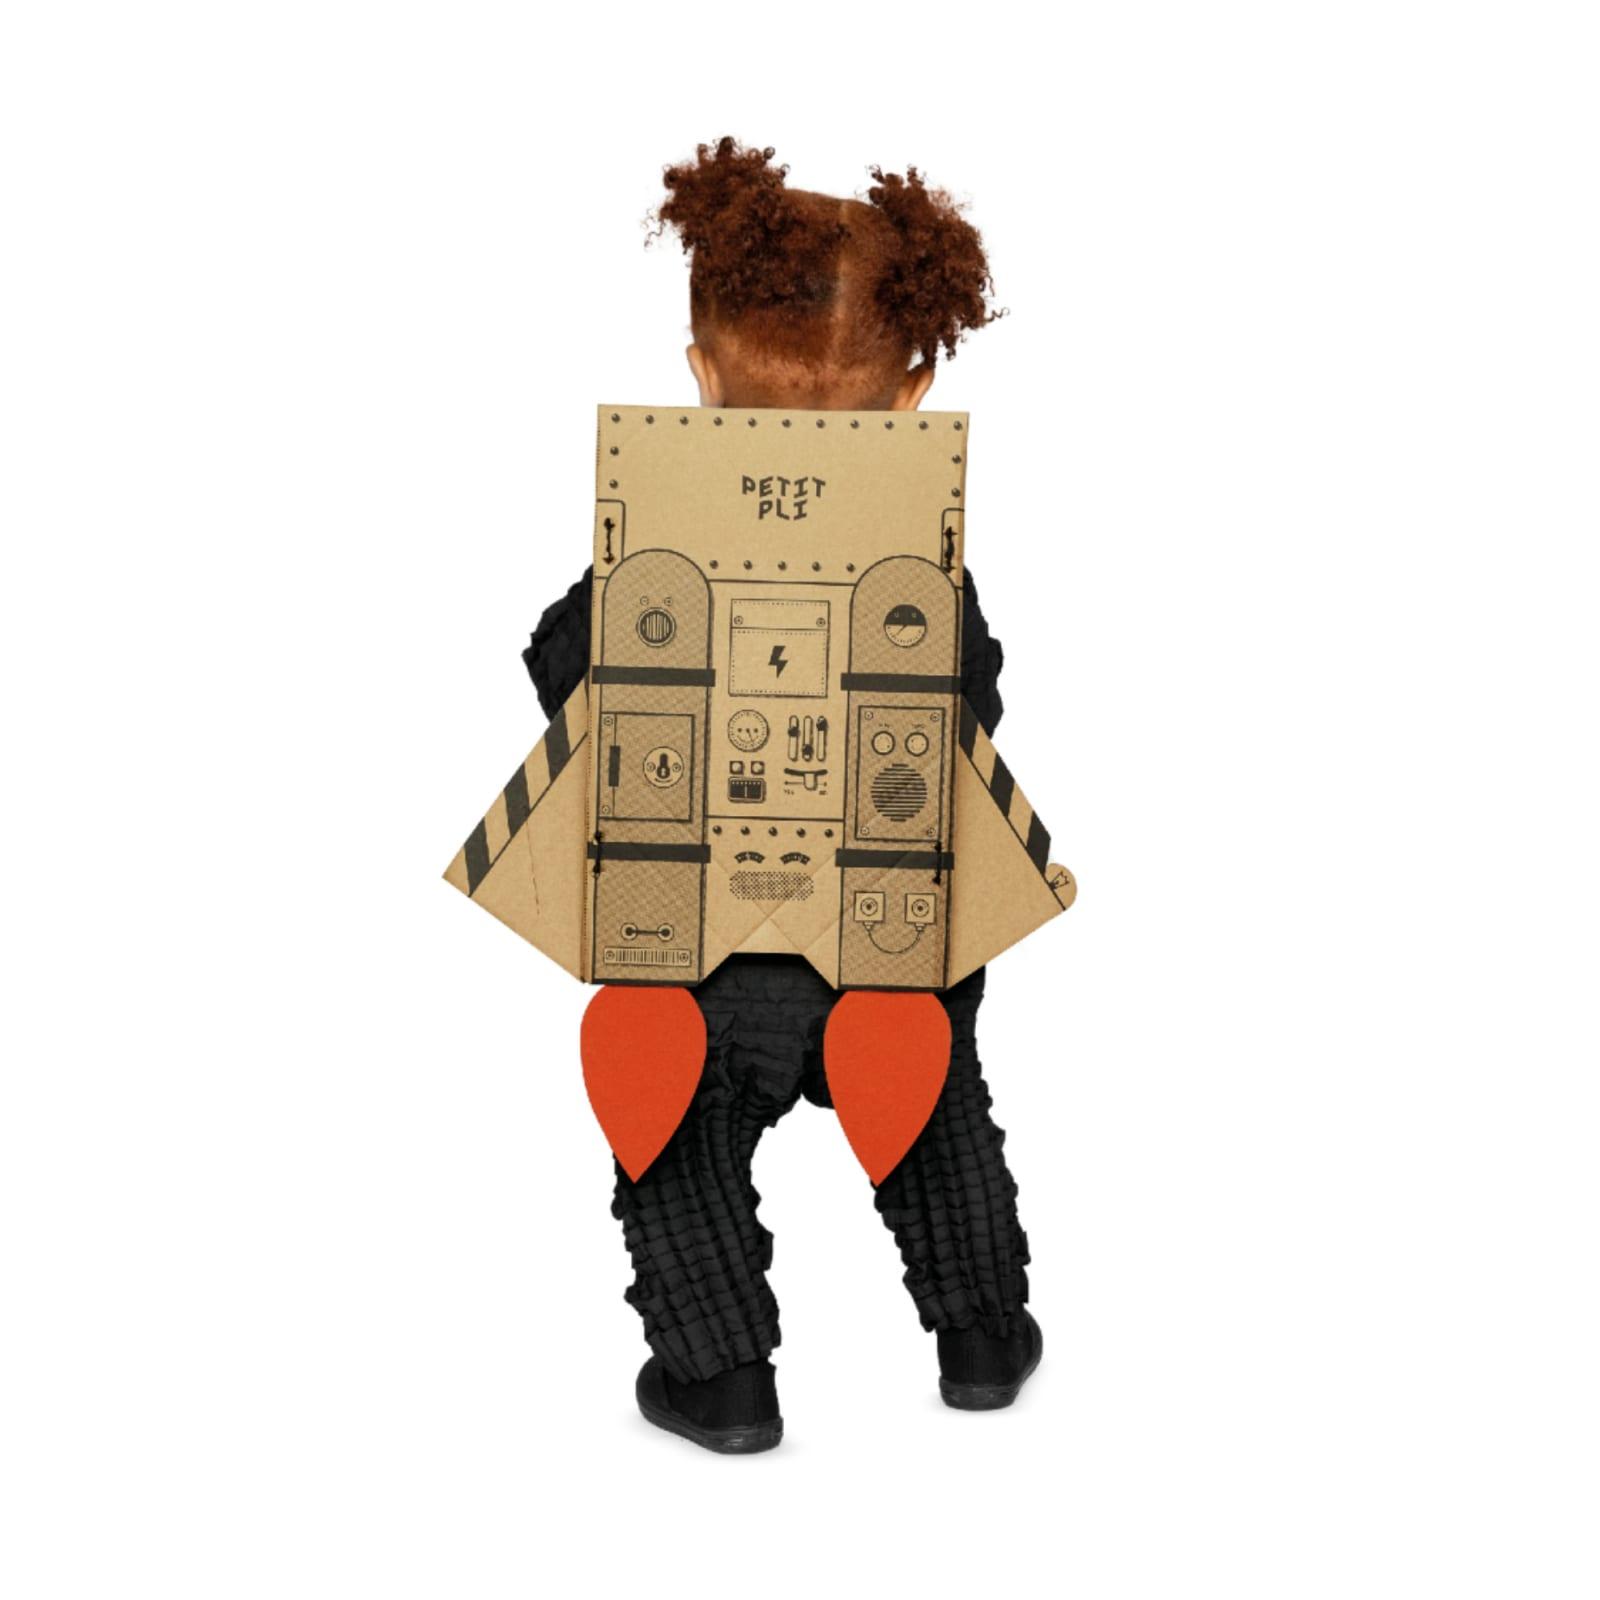 To You It's Just A Box, To A Kid It's An Entire Universe